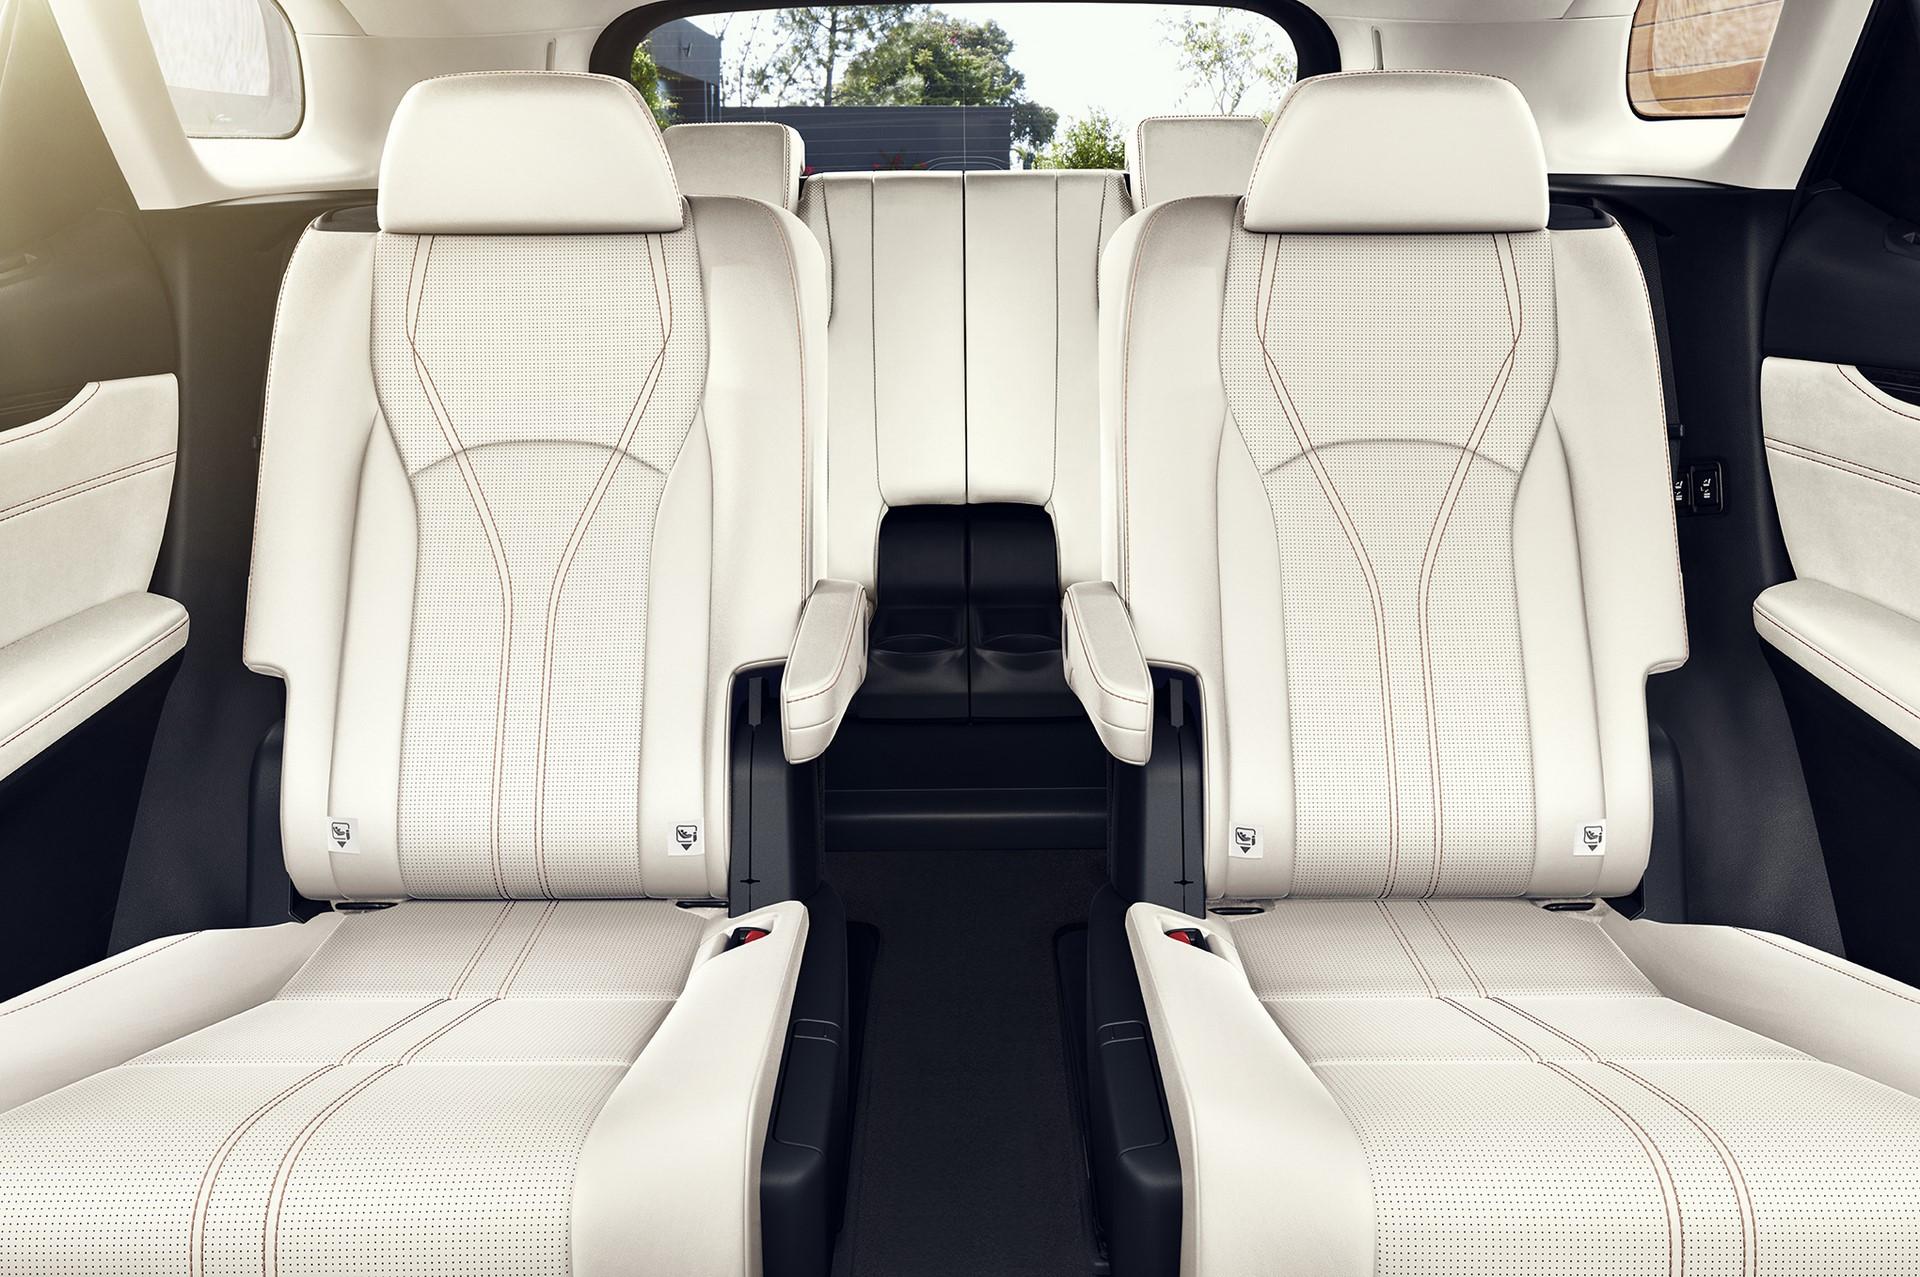 2020_Lexus_RX350L_Luxury_03_B9F08AA50A607628A280551C90CDAD85A587EC6F